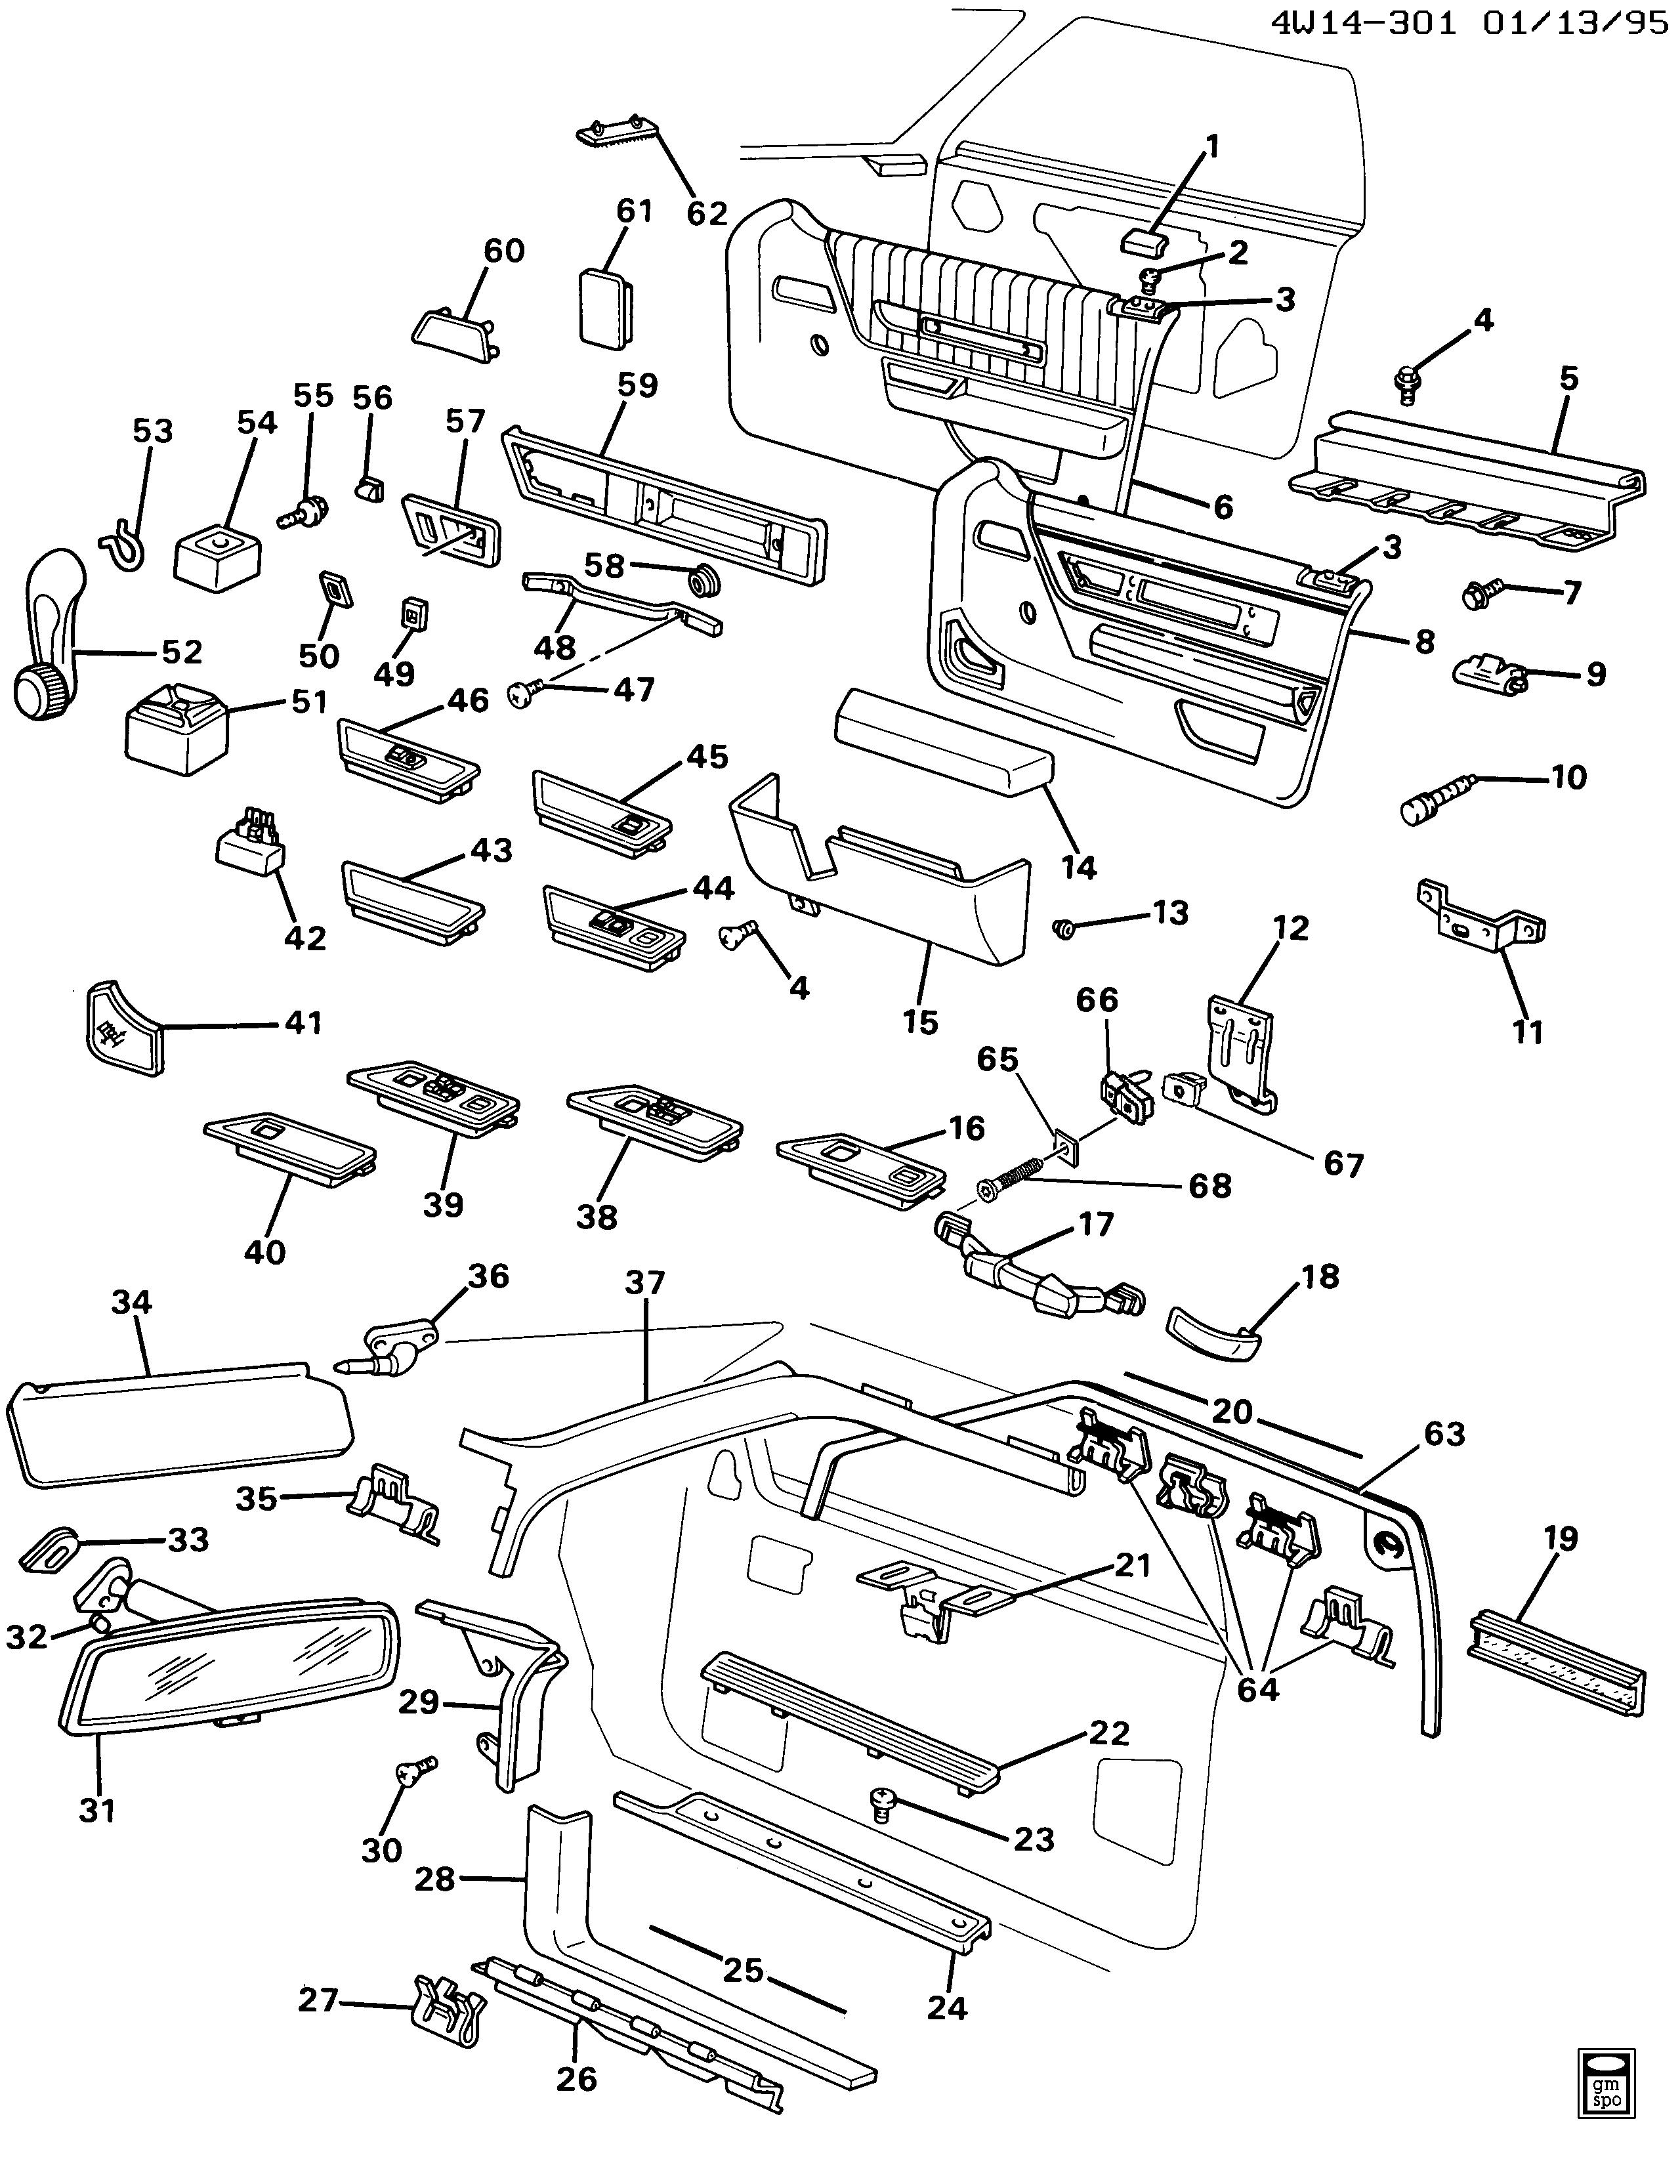 2011 buick regal wiring diagram buick regal parts diagram e3 wiring diagram  buick regal parts diagram e3 wiring